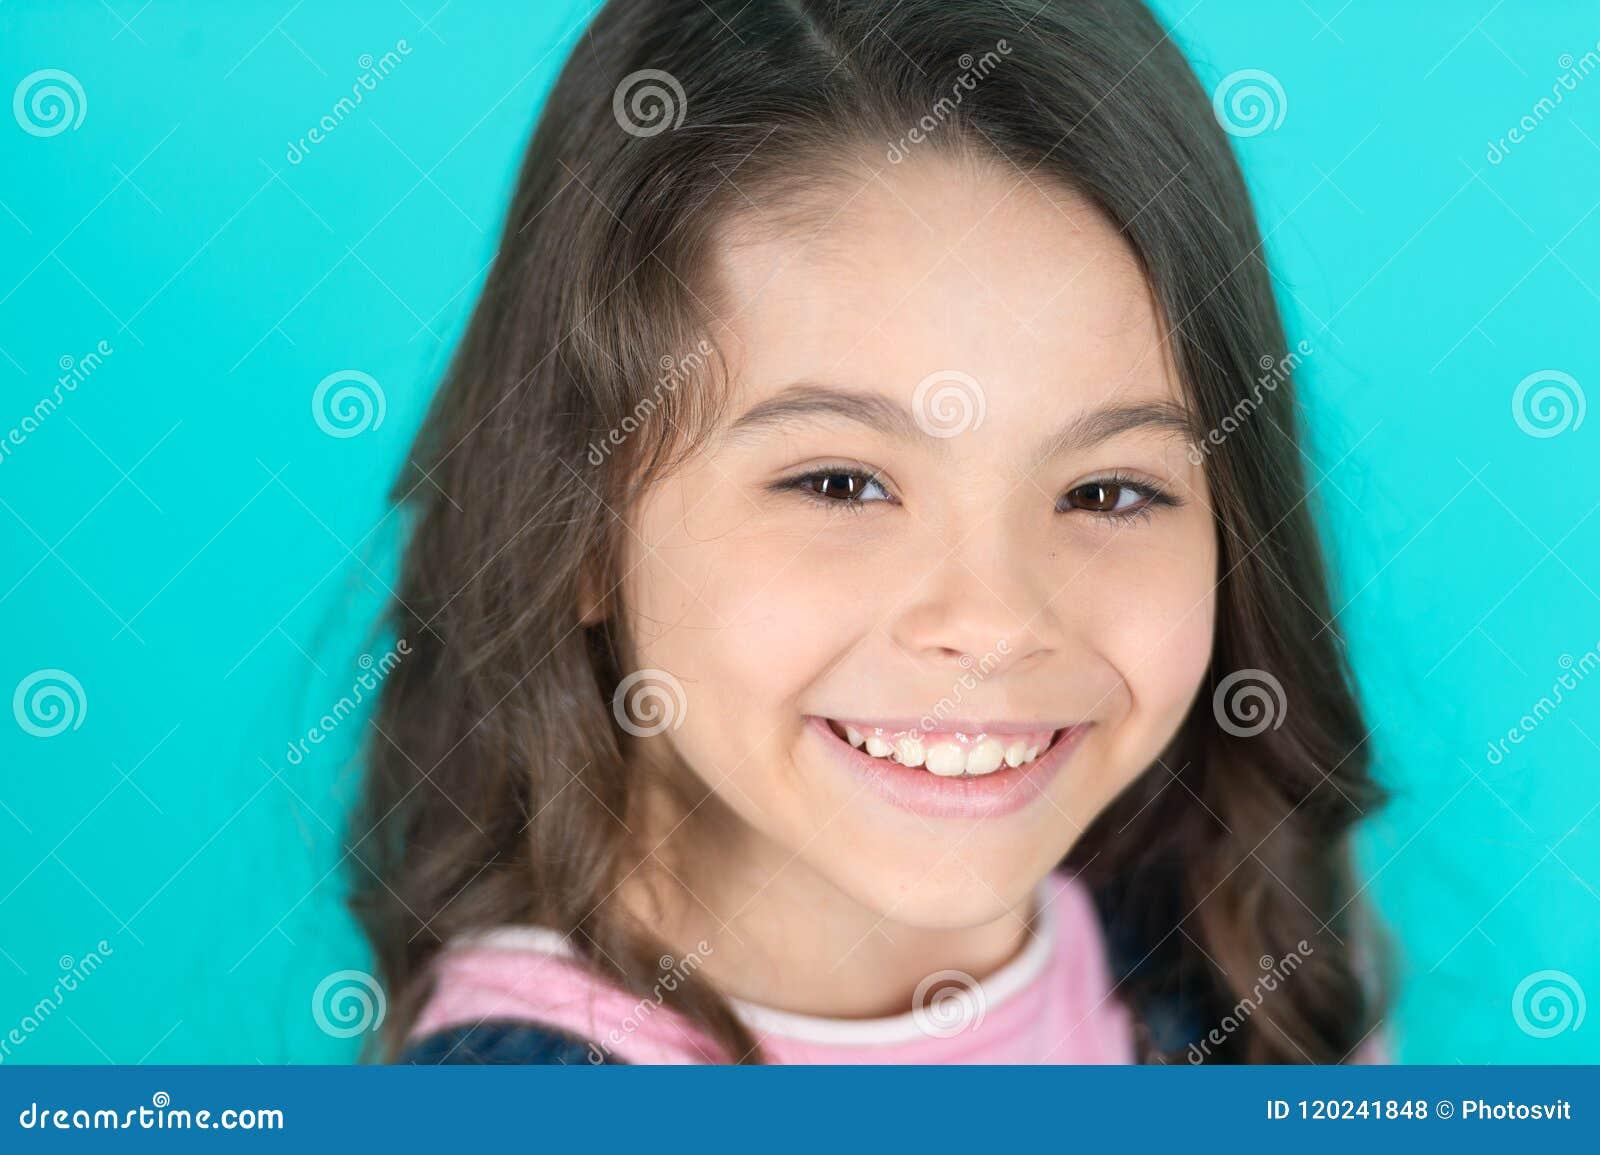 Briljante Glimlach Jong geitje gelukkige geniet onbezorgd van kinderjaren Kind die briljante glimlach turkooise achtergrond charm